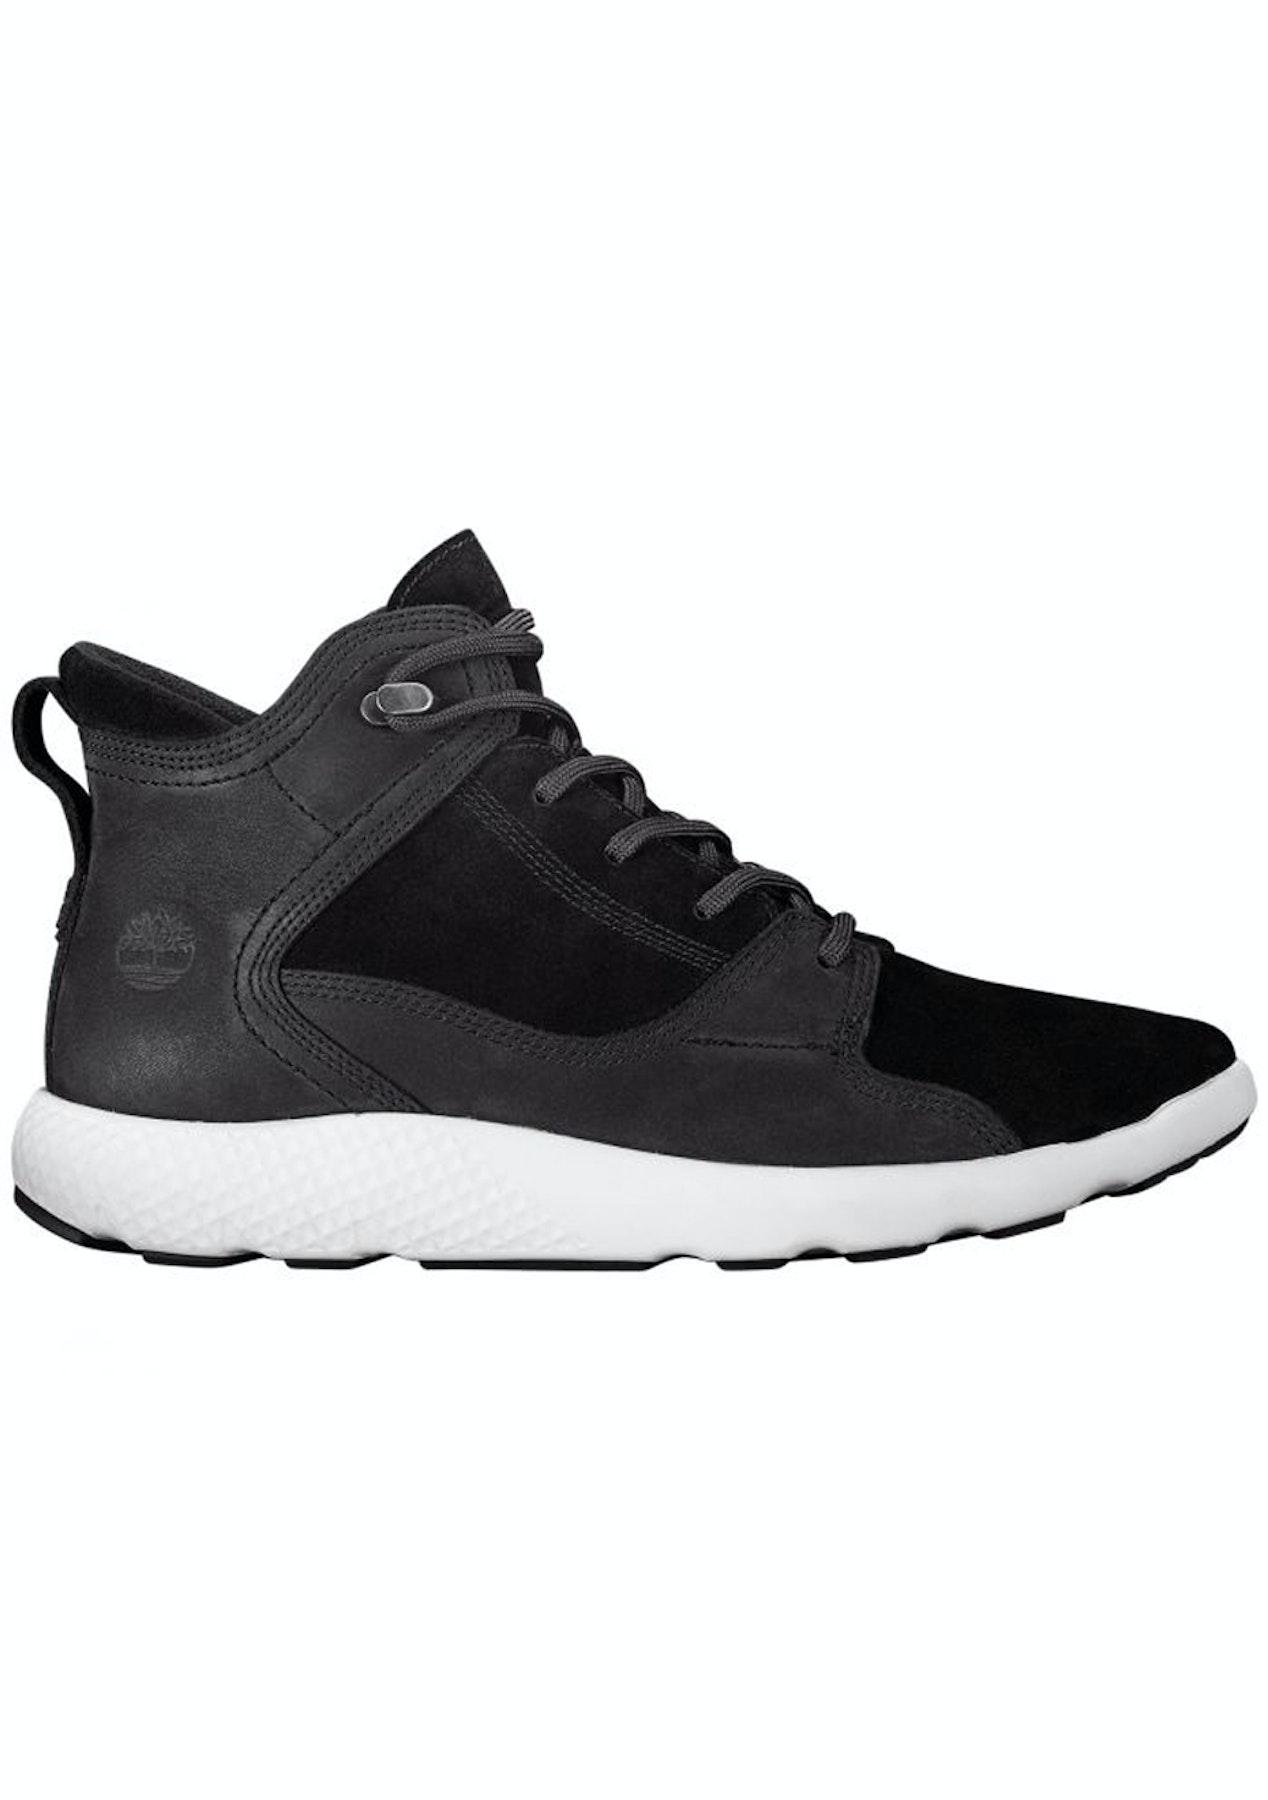 eae883f4cf99 Timberland - A1OB6 Mens Flyroam Leather Hiker - Black - Timberland - Onceit